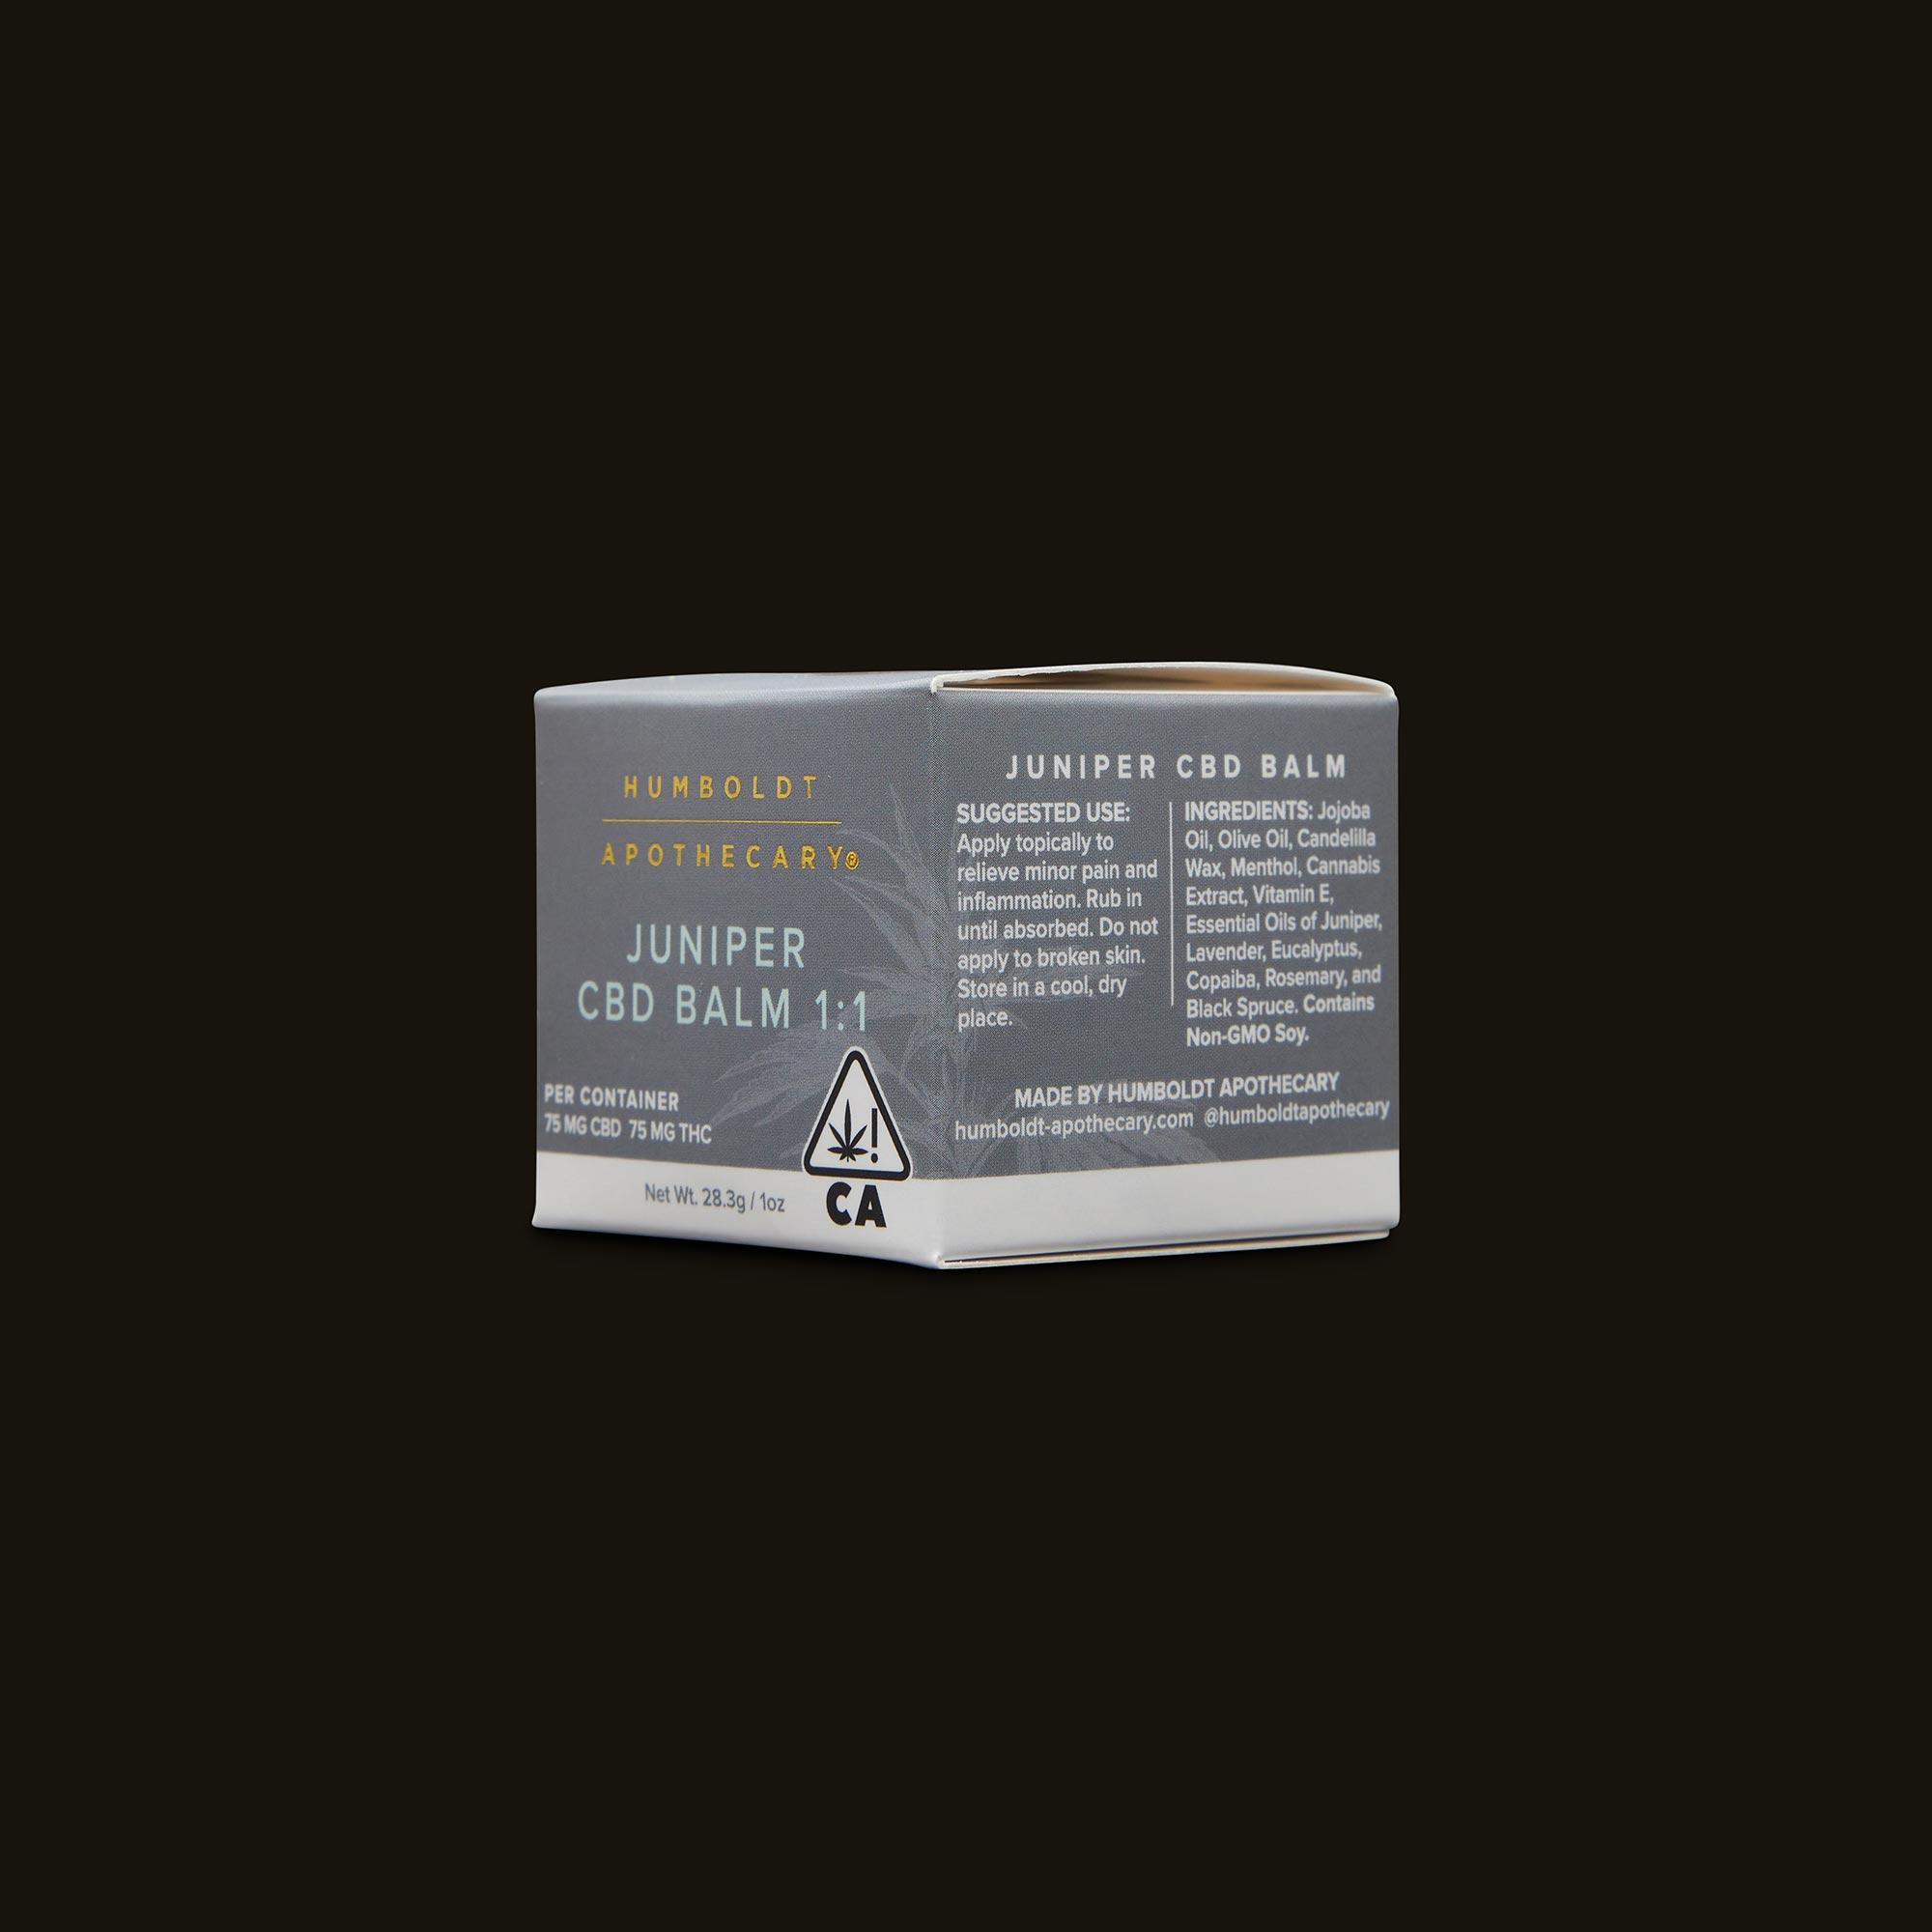 Humboldt Apothecary Juniper CBD Balm Ingredients